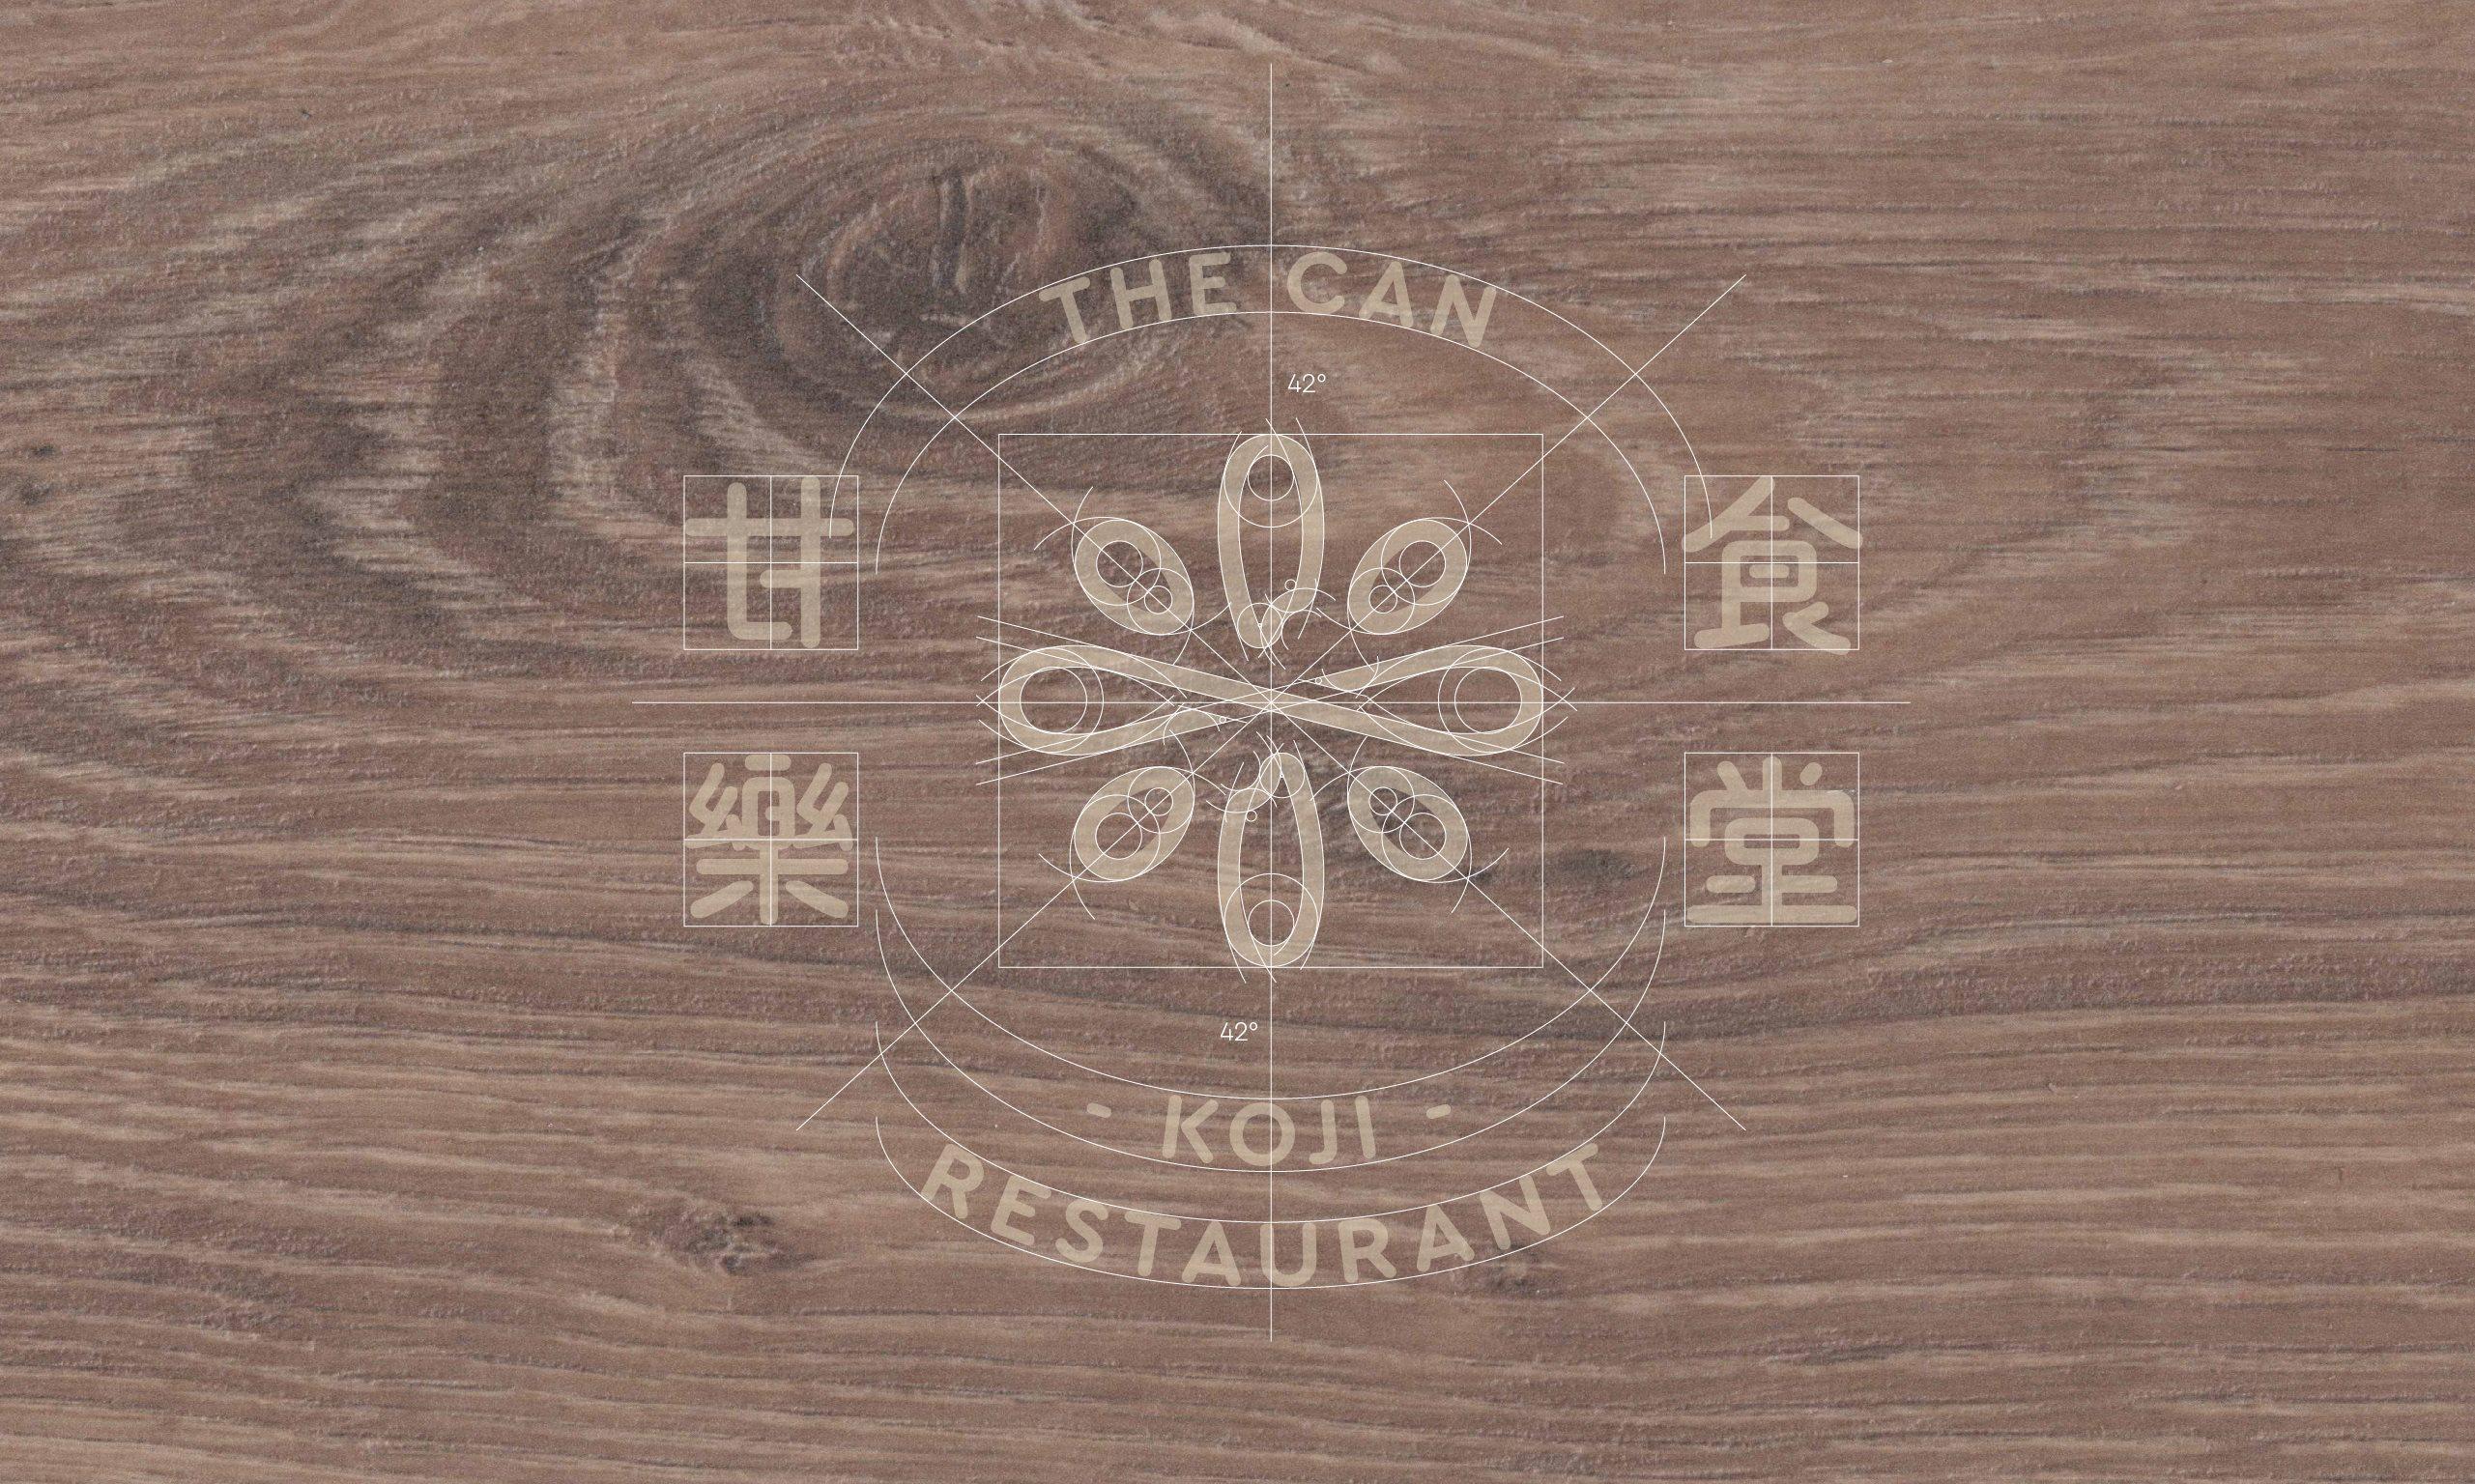 Corporate Identity System of KOUJI Restaurant - Taiwan brand design